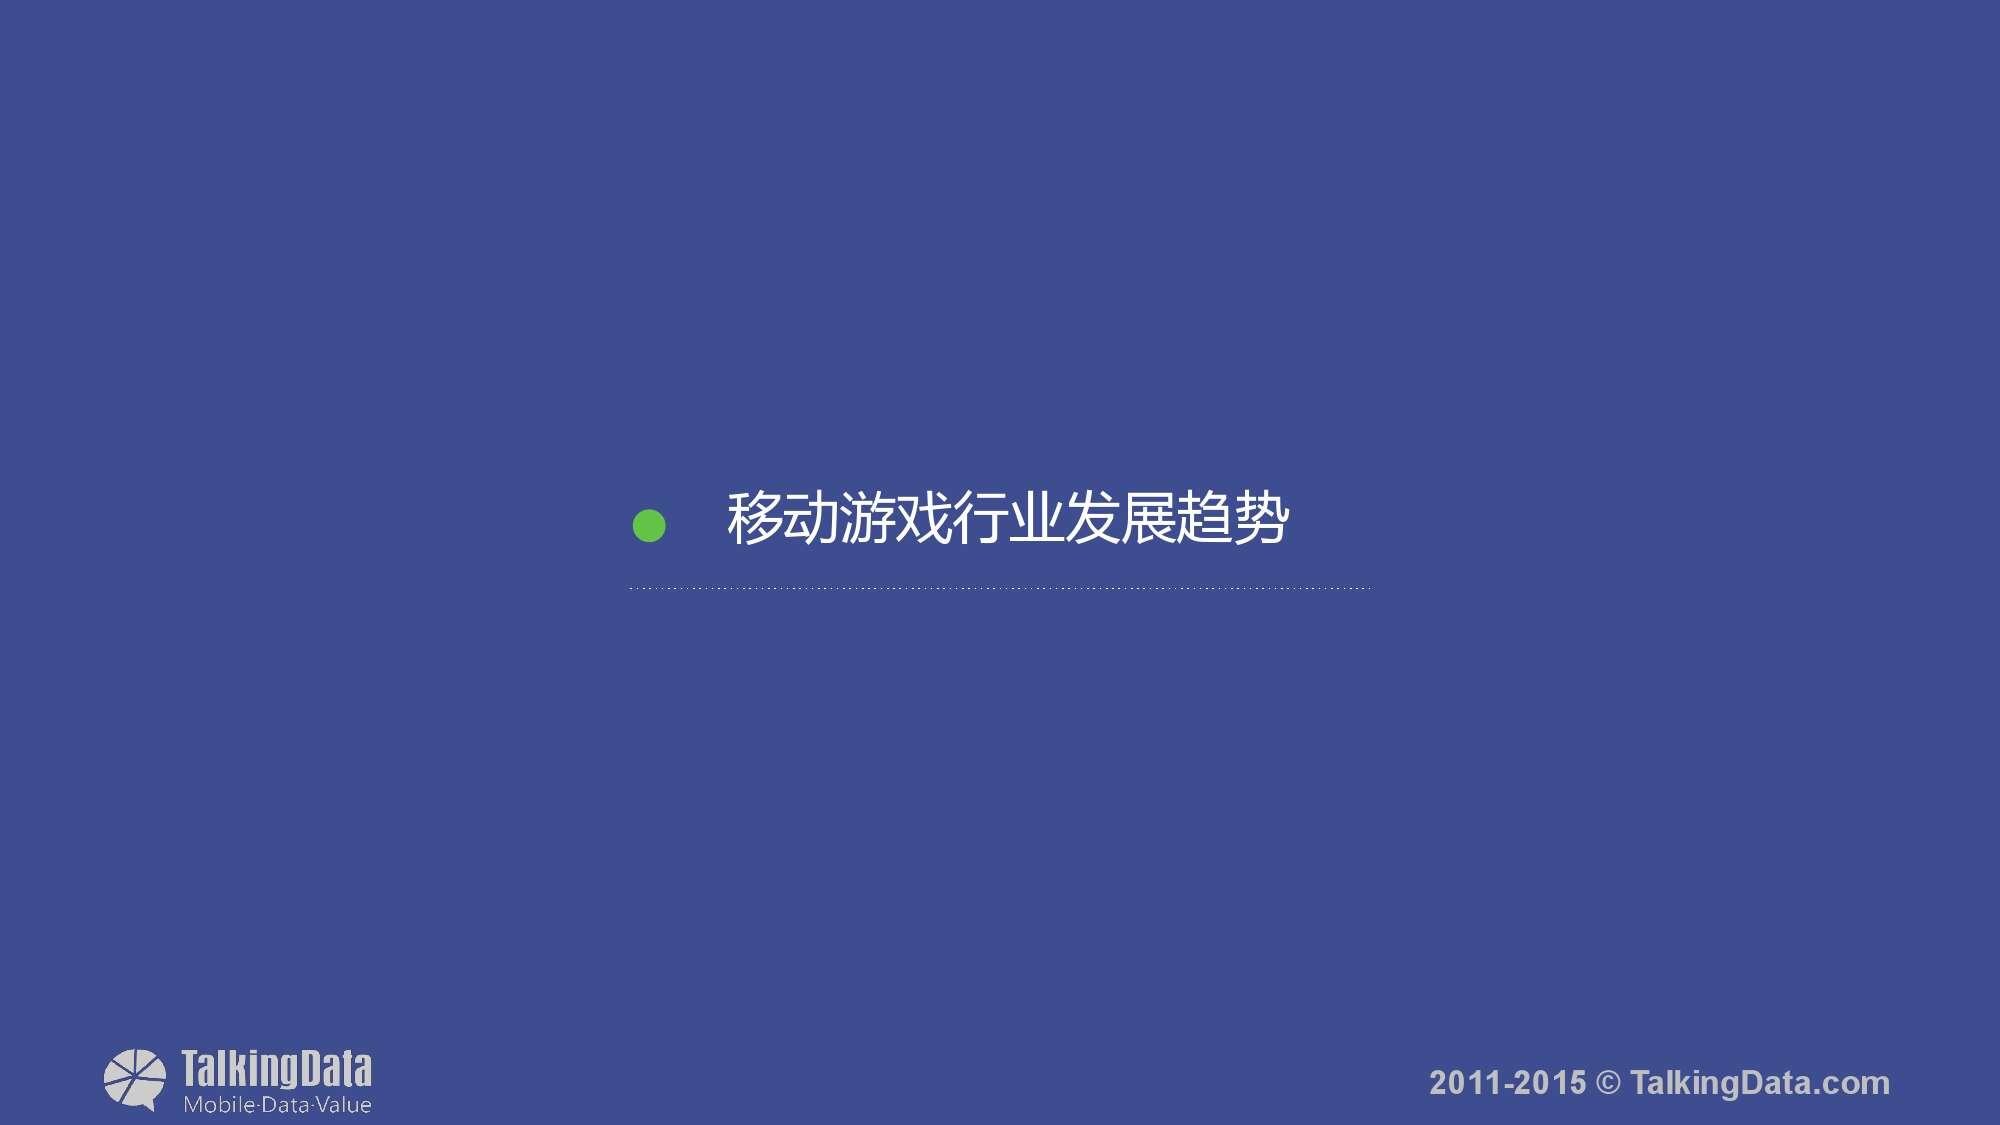 TalkingData-2015年移动游戏行业报告_000052